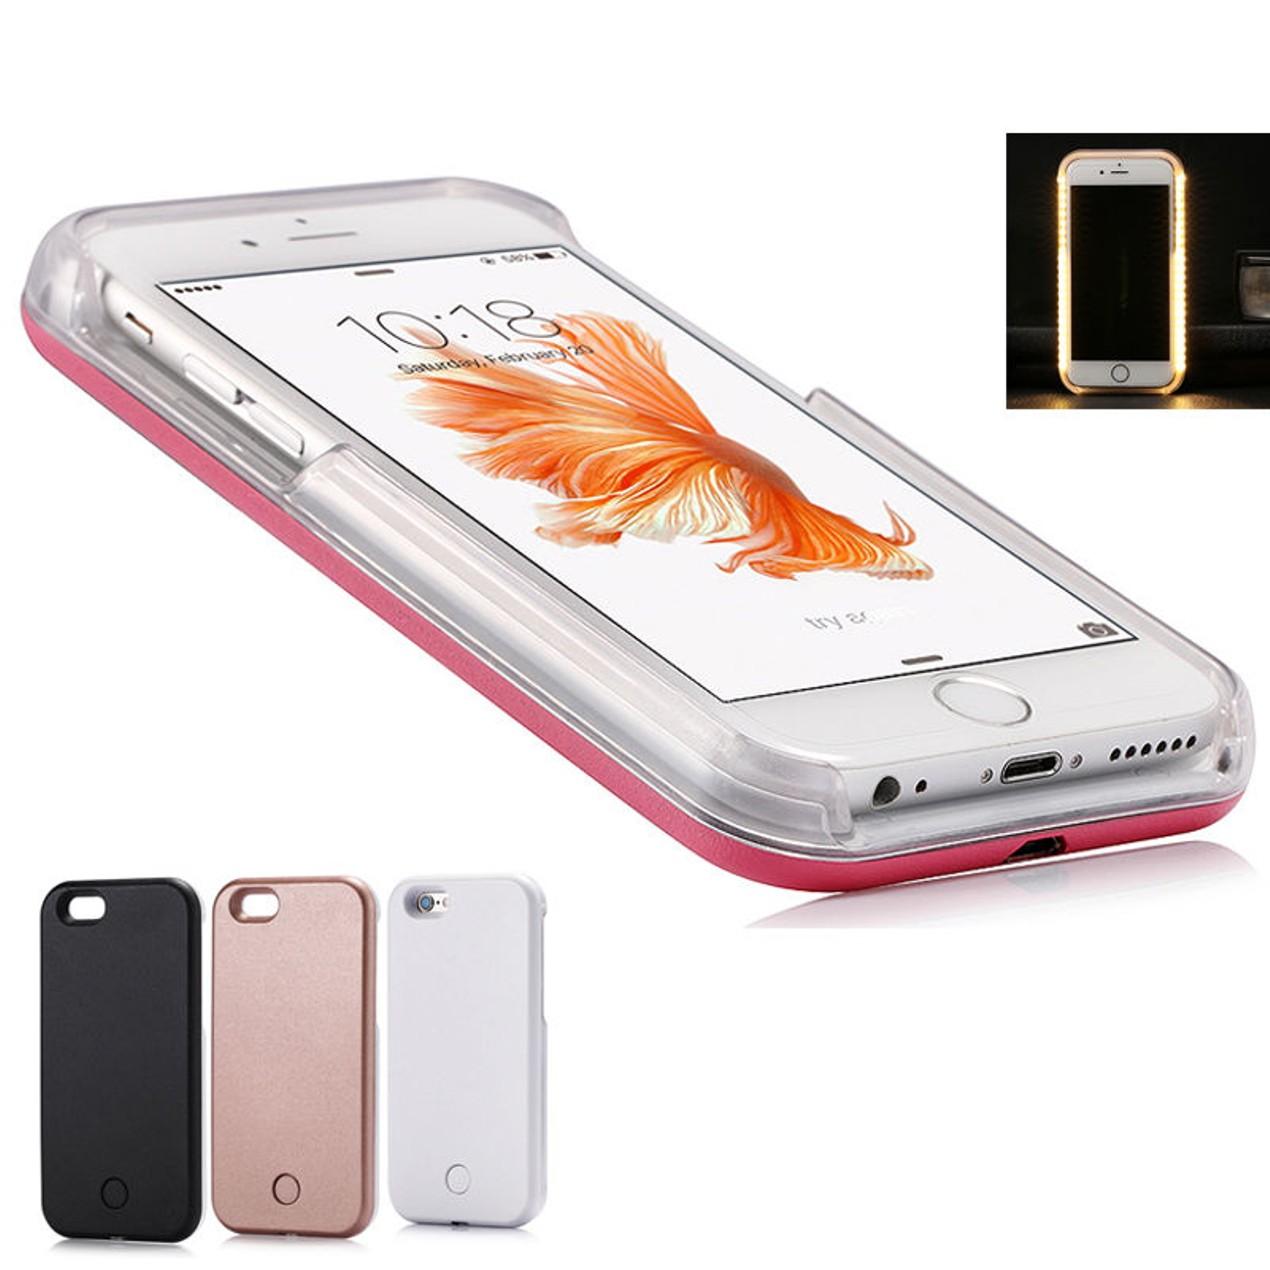 Iphone 6 6s Or Plus Selfie Led Lit Case Tanga